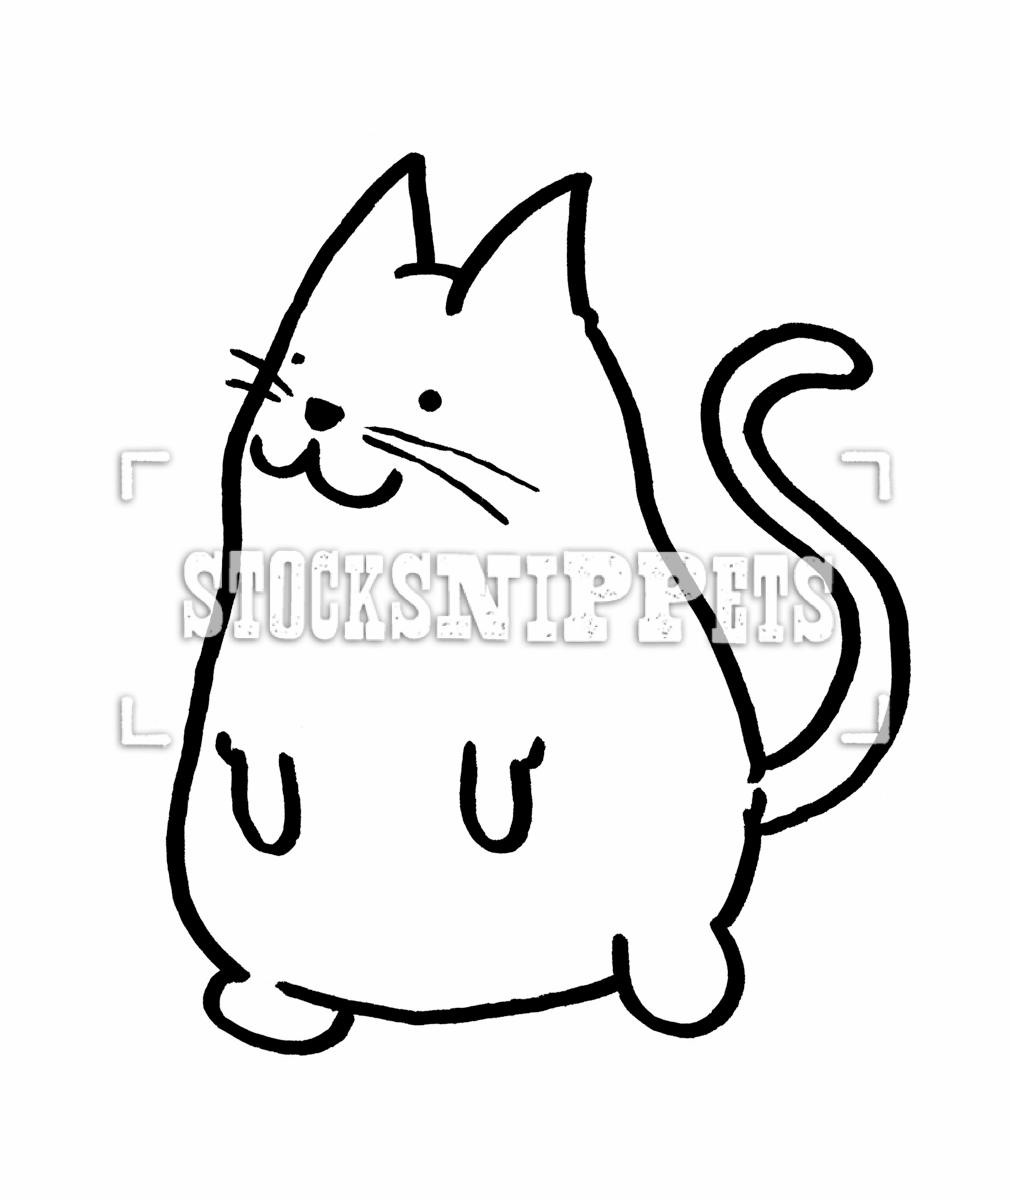 Drawn cute cat Drawn Stocksnippets Free Cat Hand